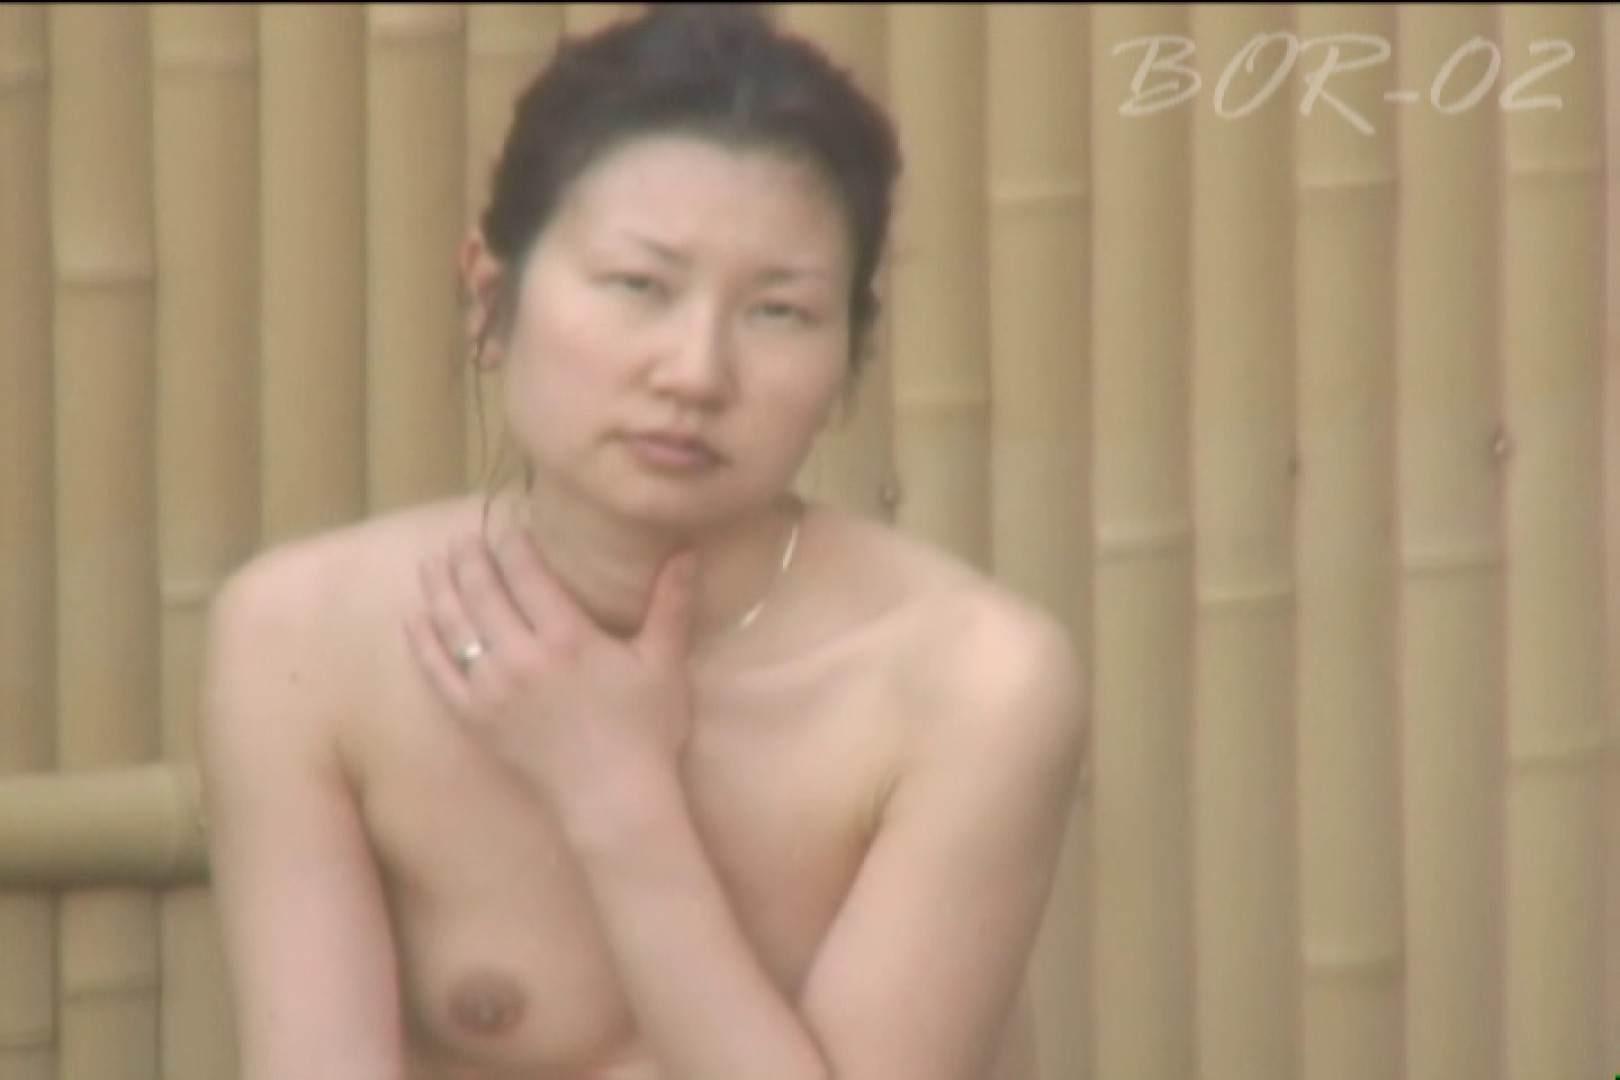 Aquaな露天風呂Vol.477 盗撮   OLエロ画像  99PICs 82